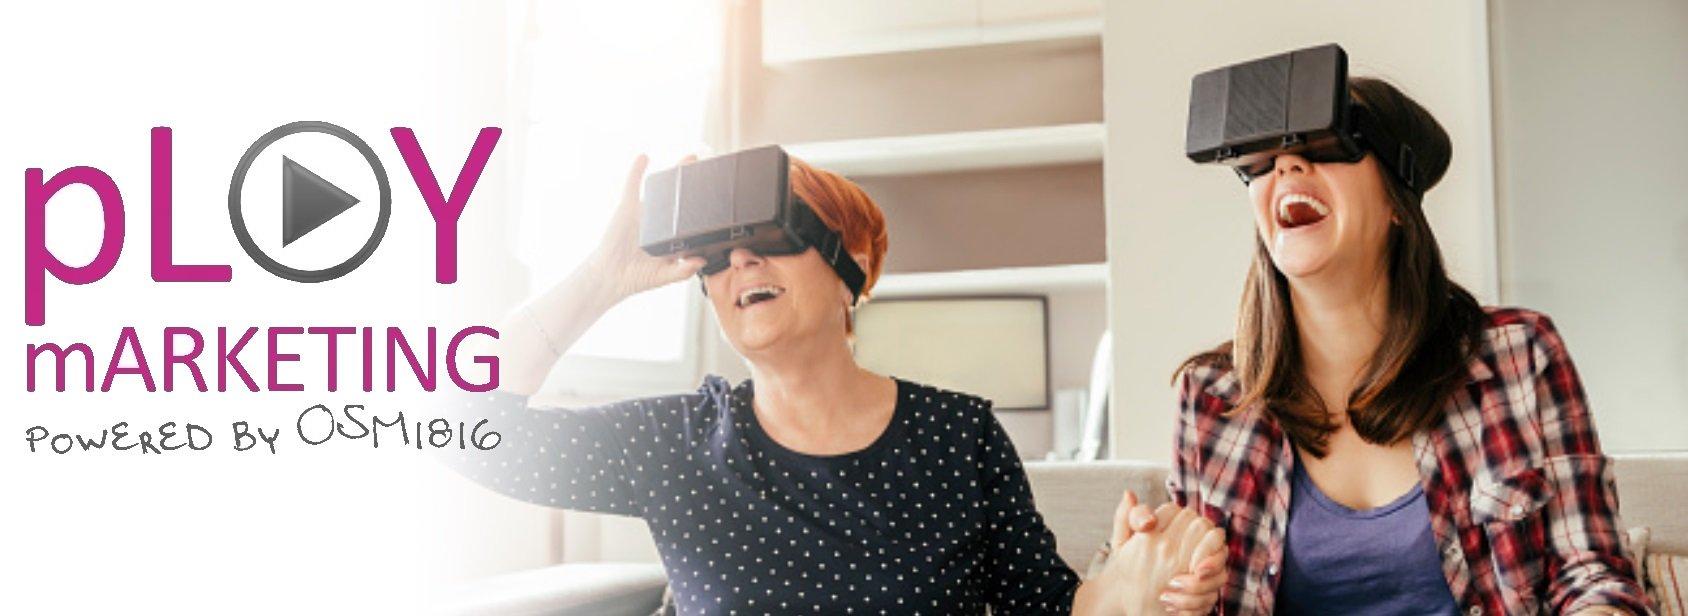 La Realtà Virtuale riunisce le famiglie lontane